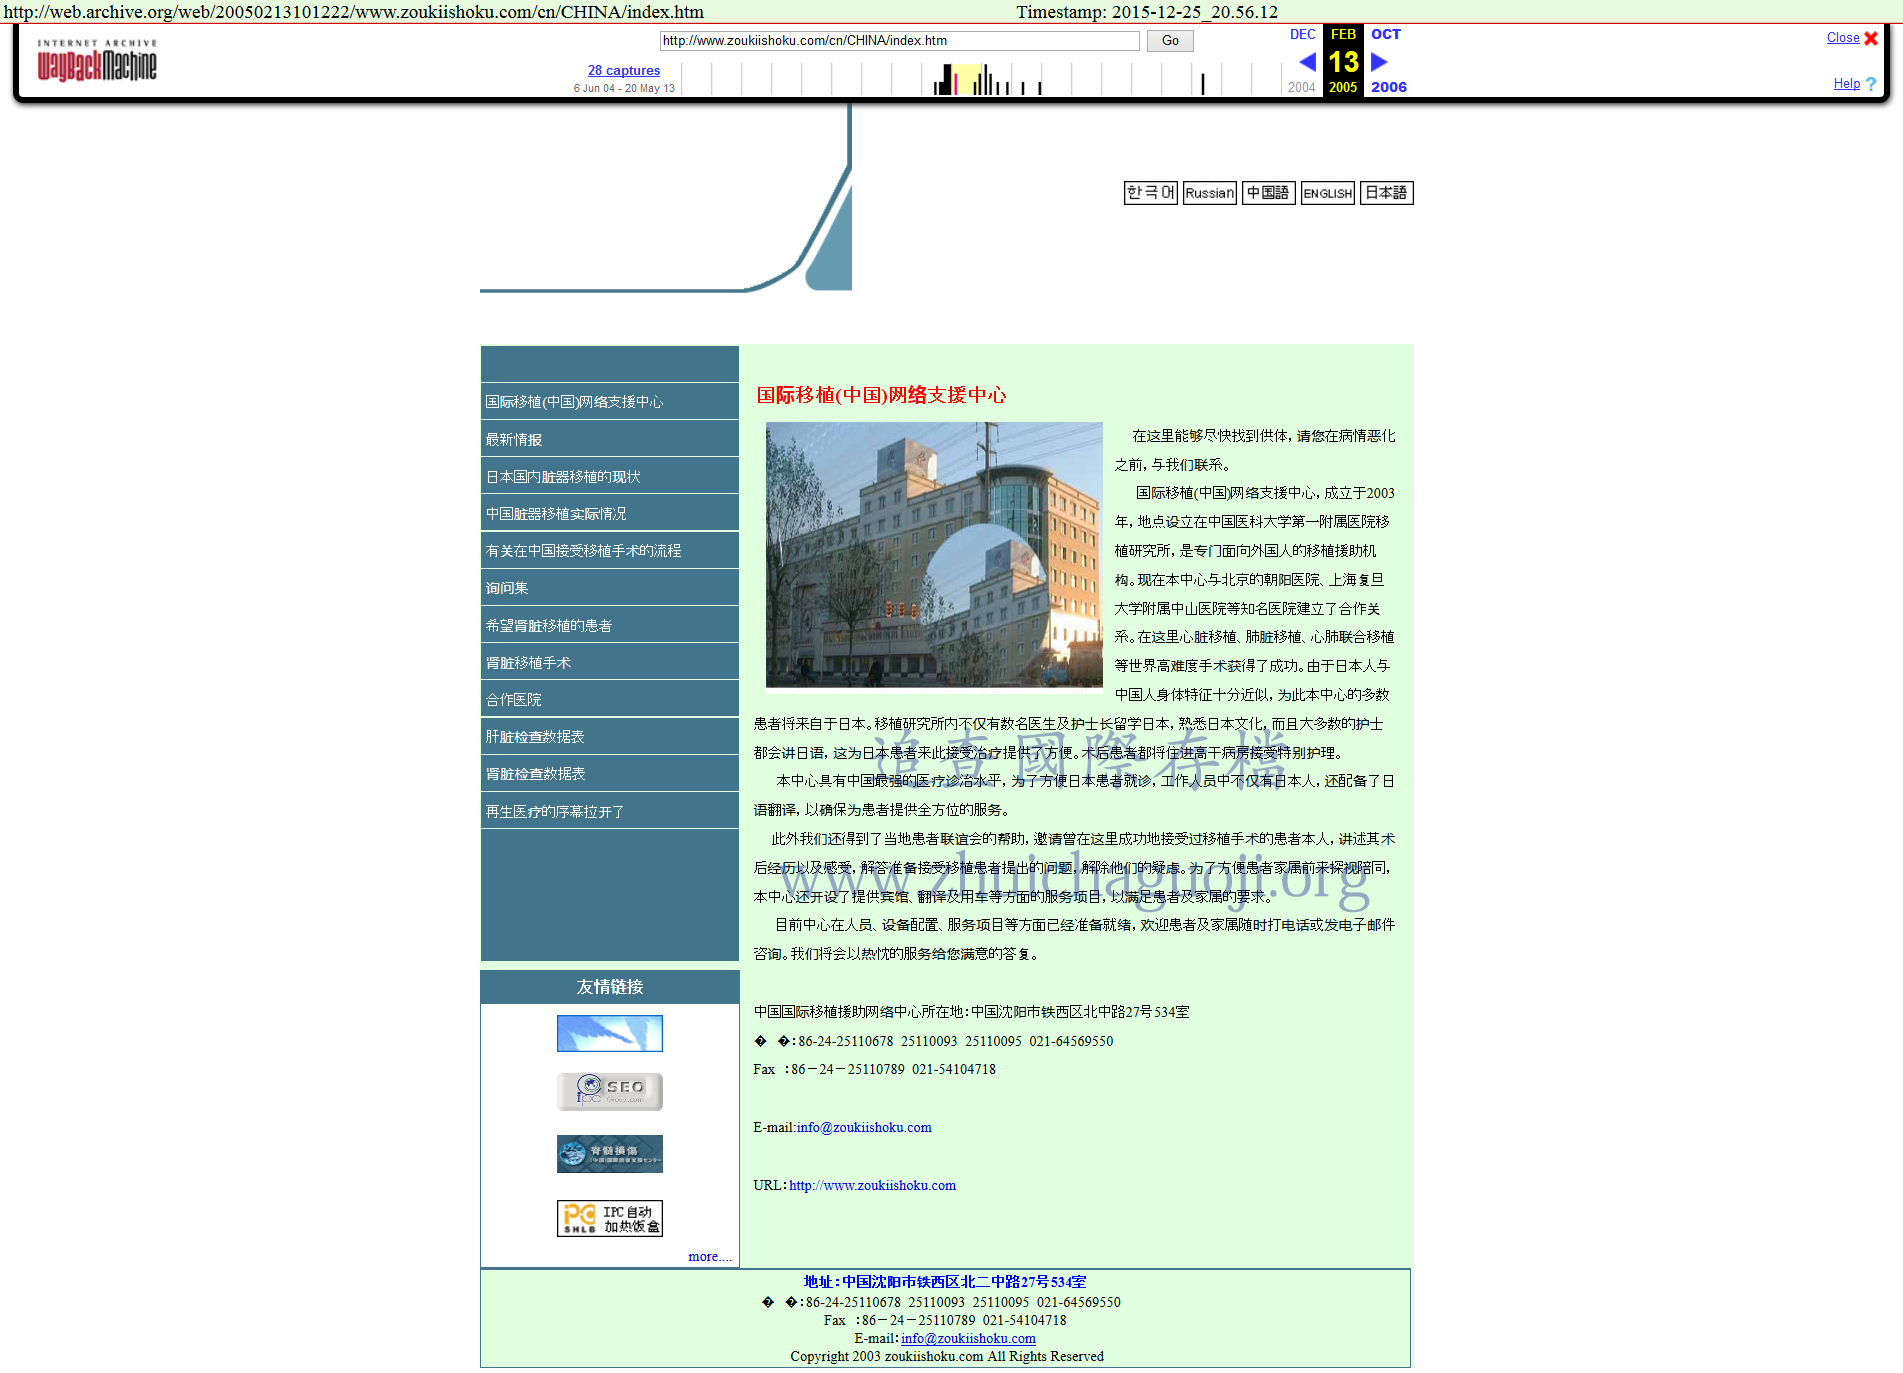 How To Pdf From Http //wenku.baidu.com